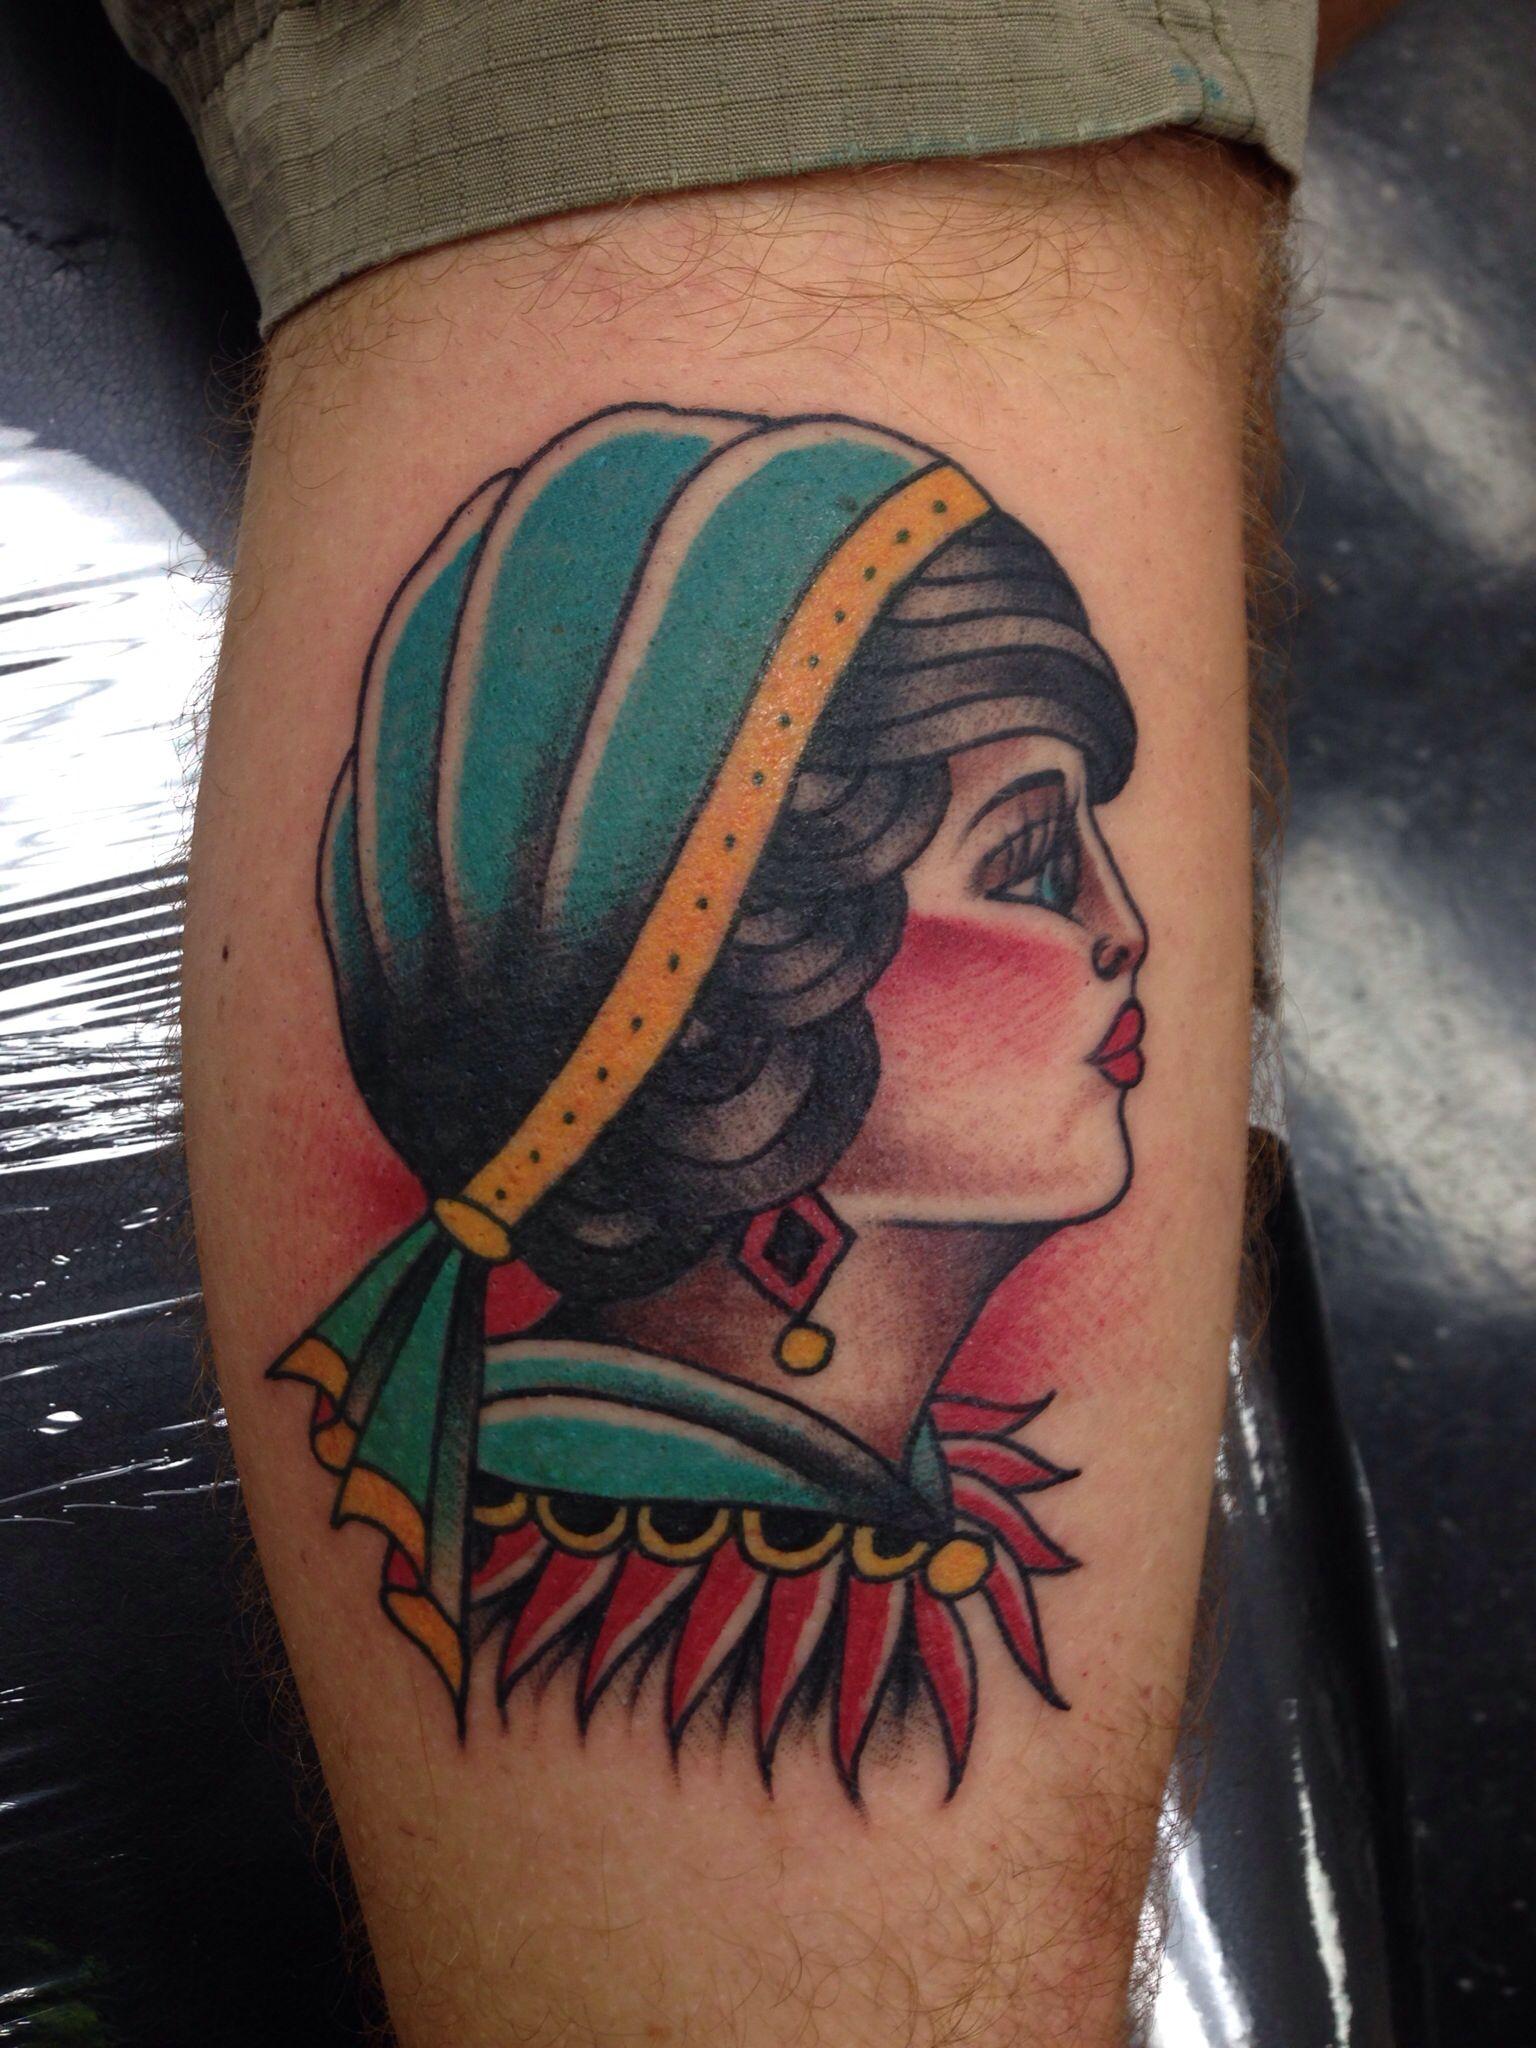 Artist Elmer Fudd Rodriguez Orange County California Instagram Elmerfuddtattoos Ameri Traditional Tattoo American Traditional Tattoo American Traditional